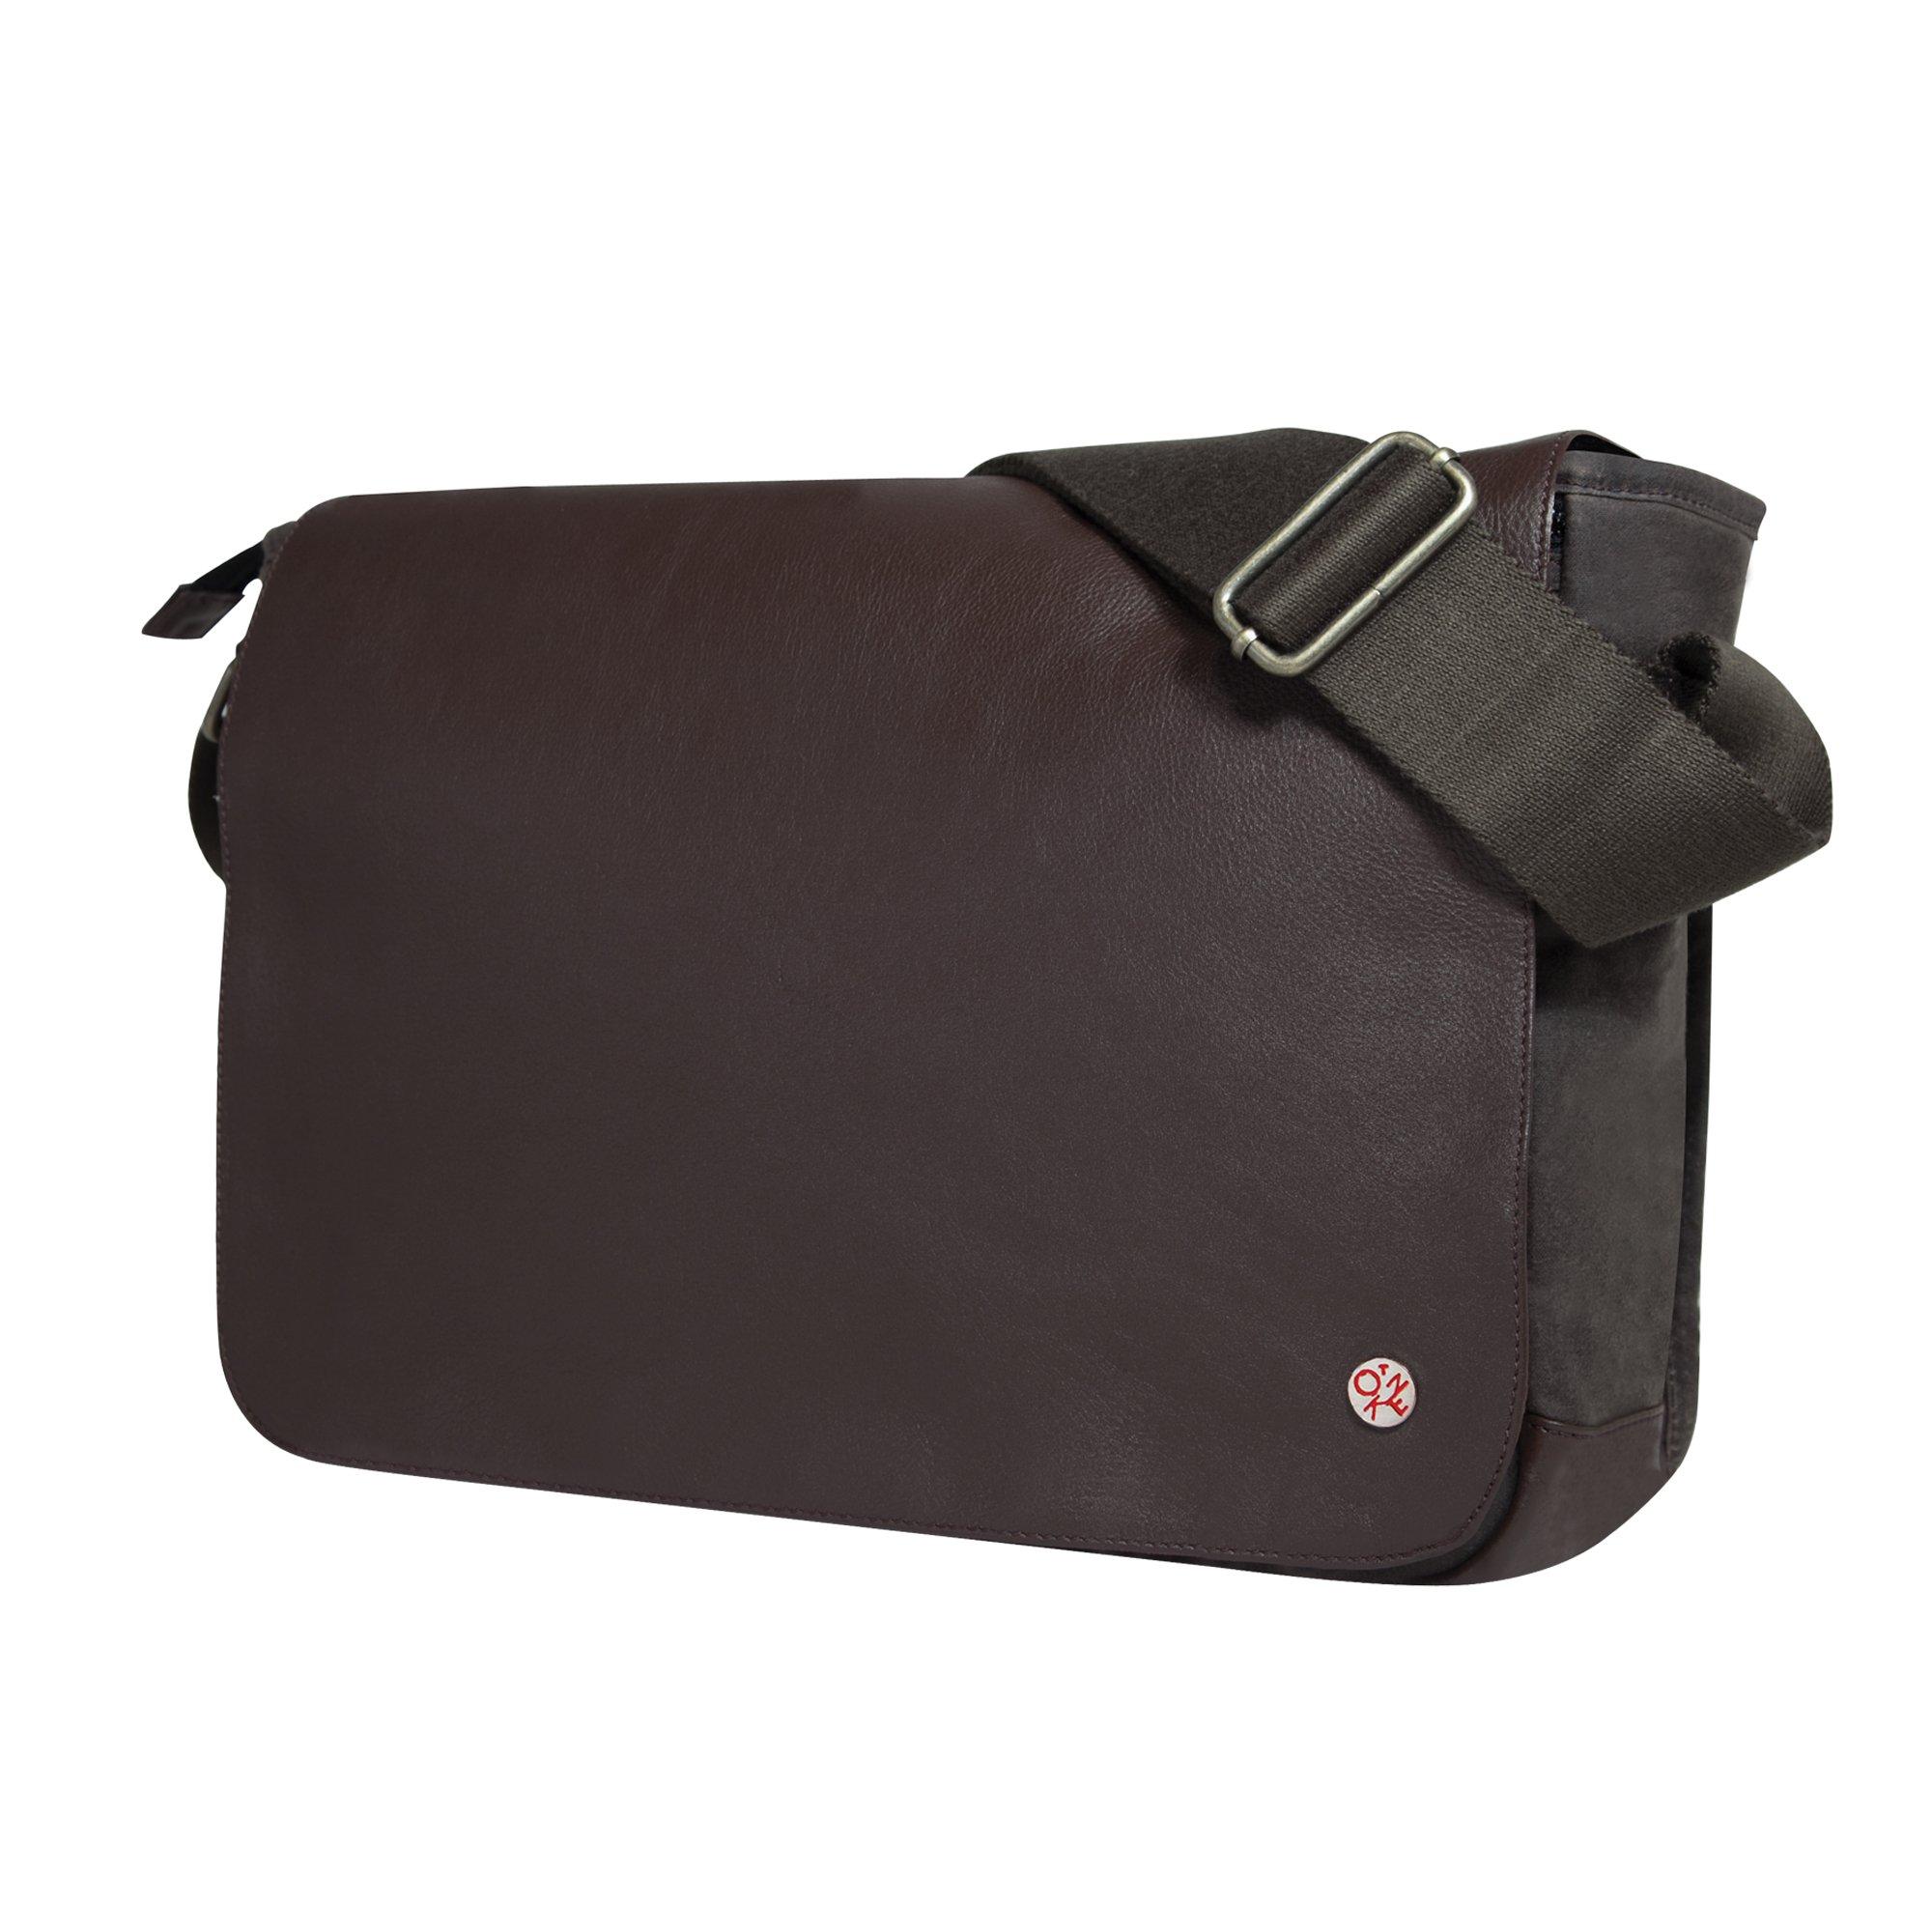 Token Bags Sheridan Waxed Shoulder Bag, Dark Brown, One Size